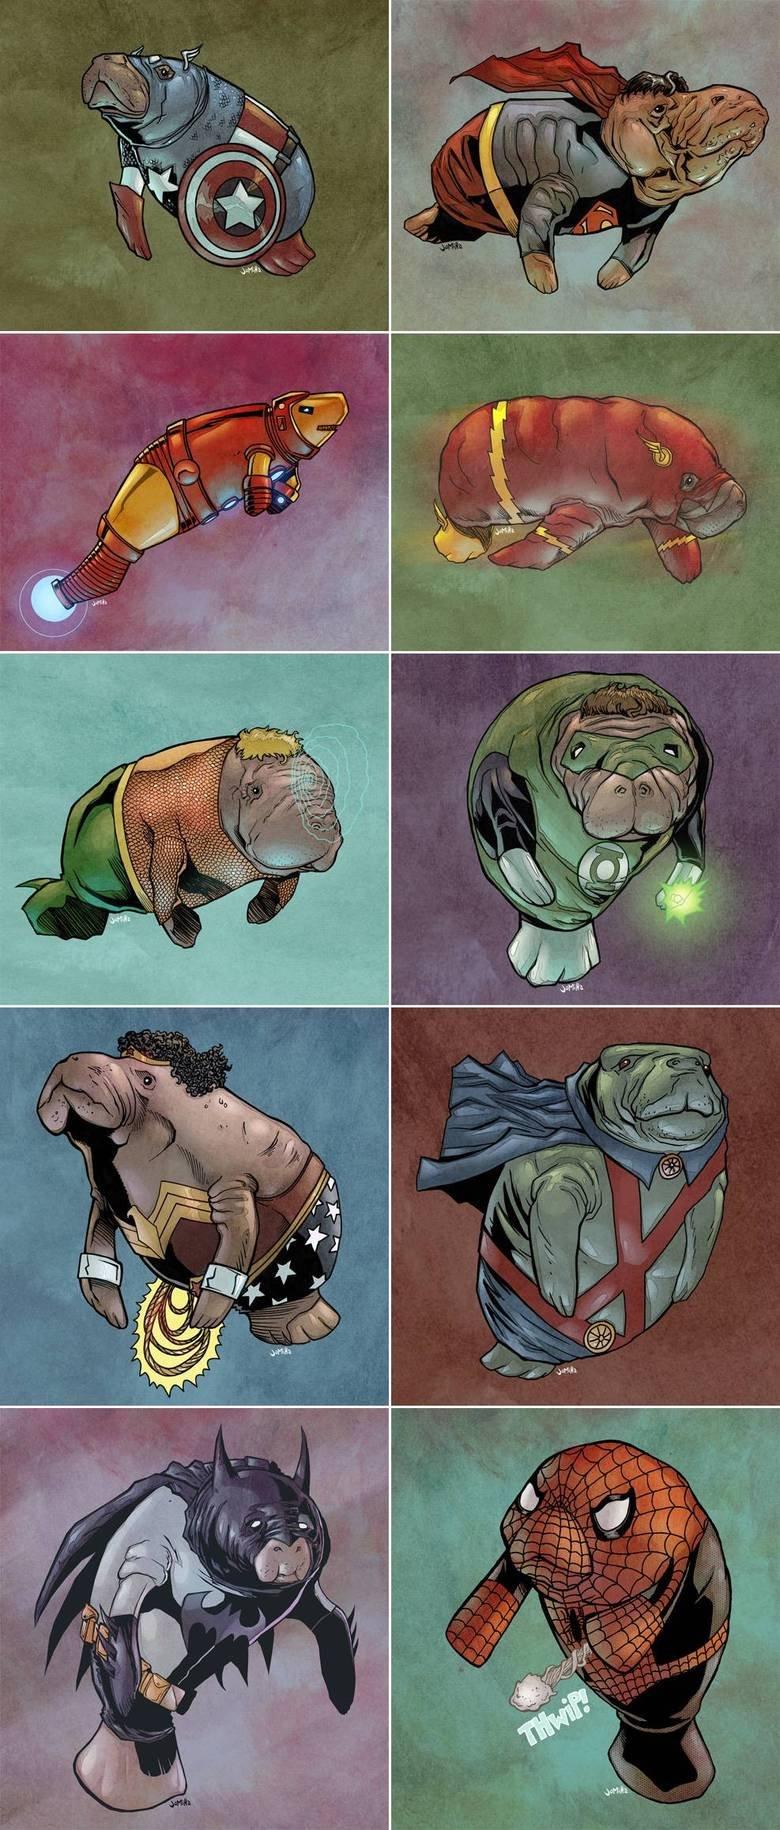 Manatee Superheroes. .. Lost it at Aquamanatee.